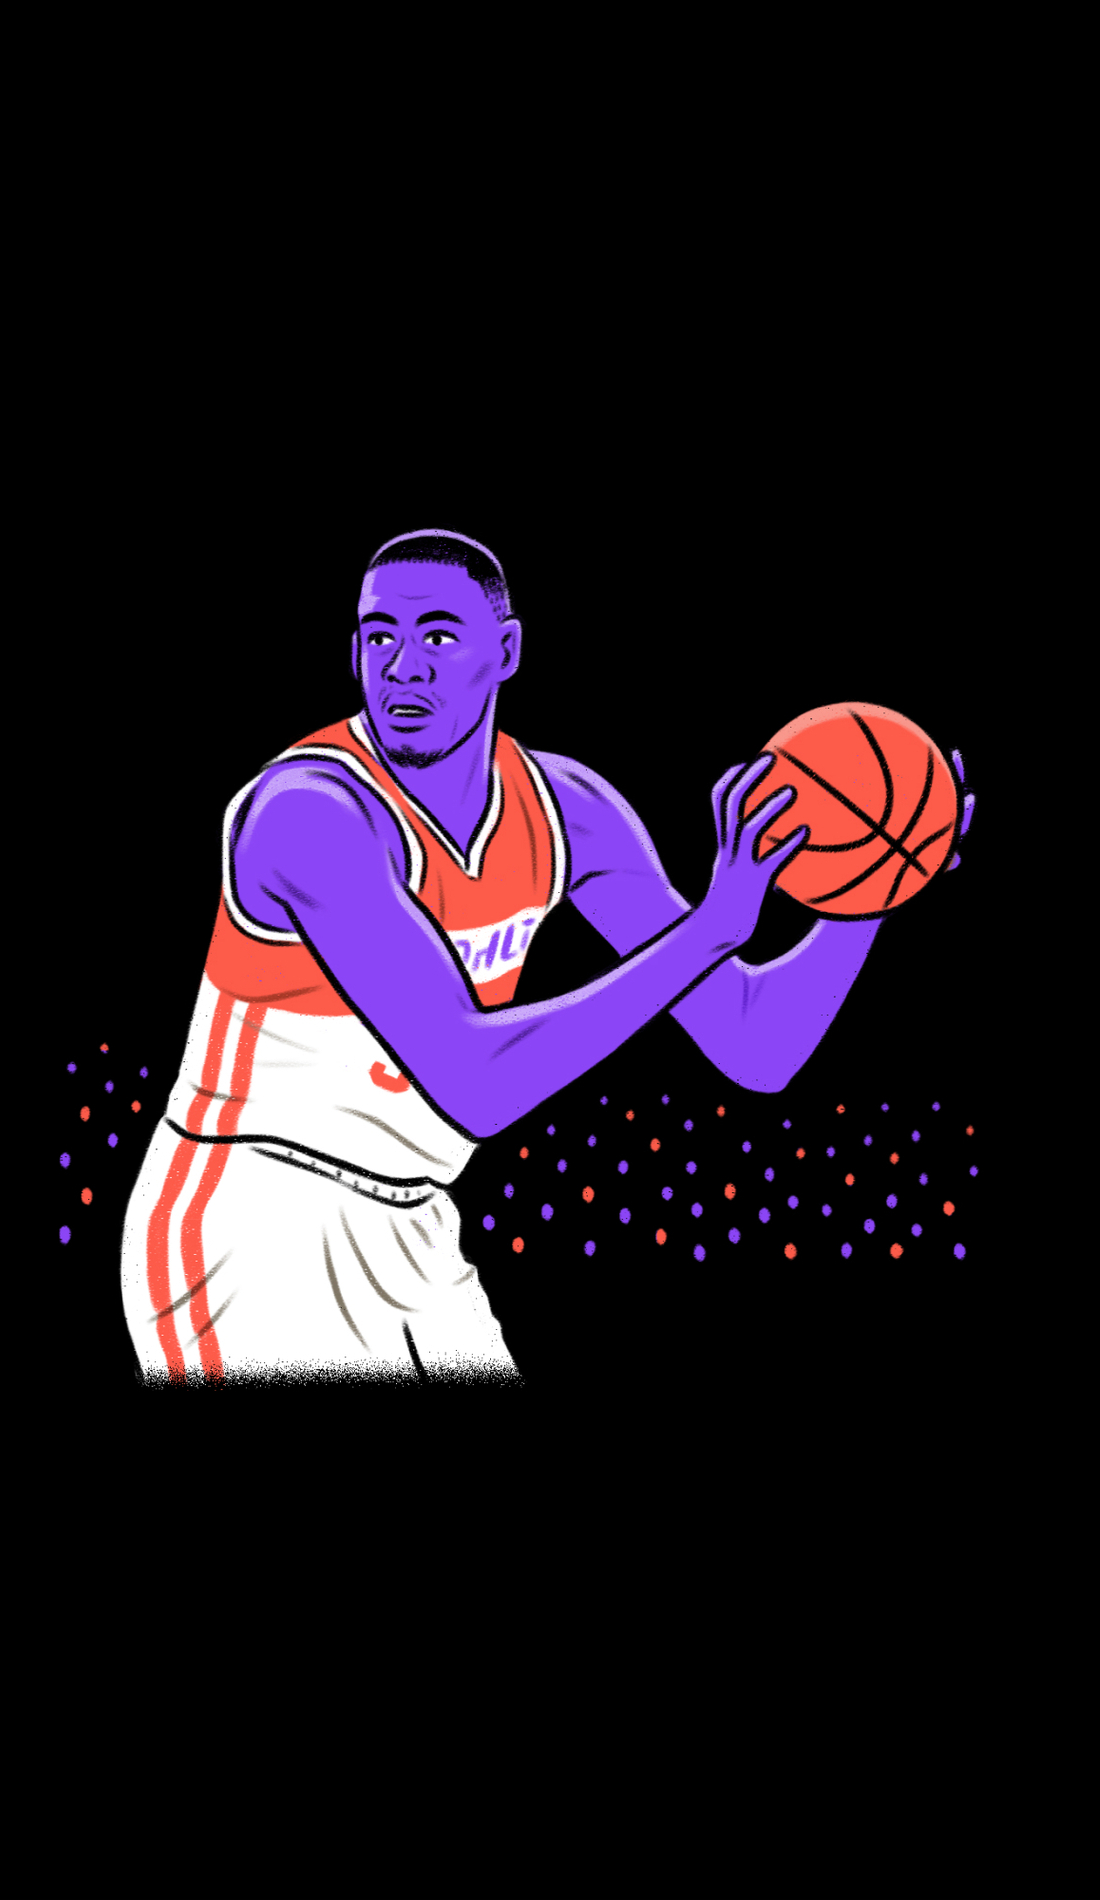 A Miami RedHawks Basketball live event